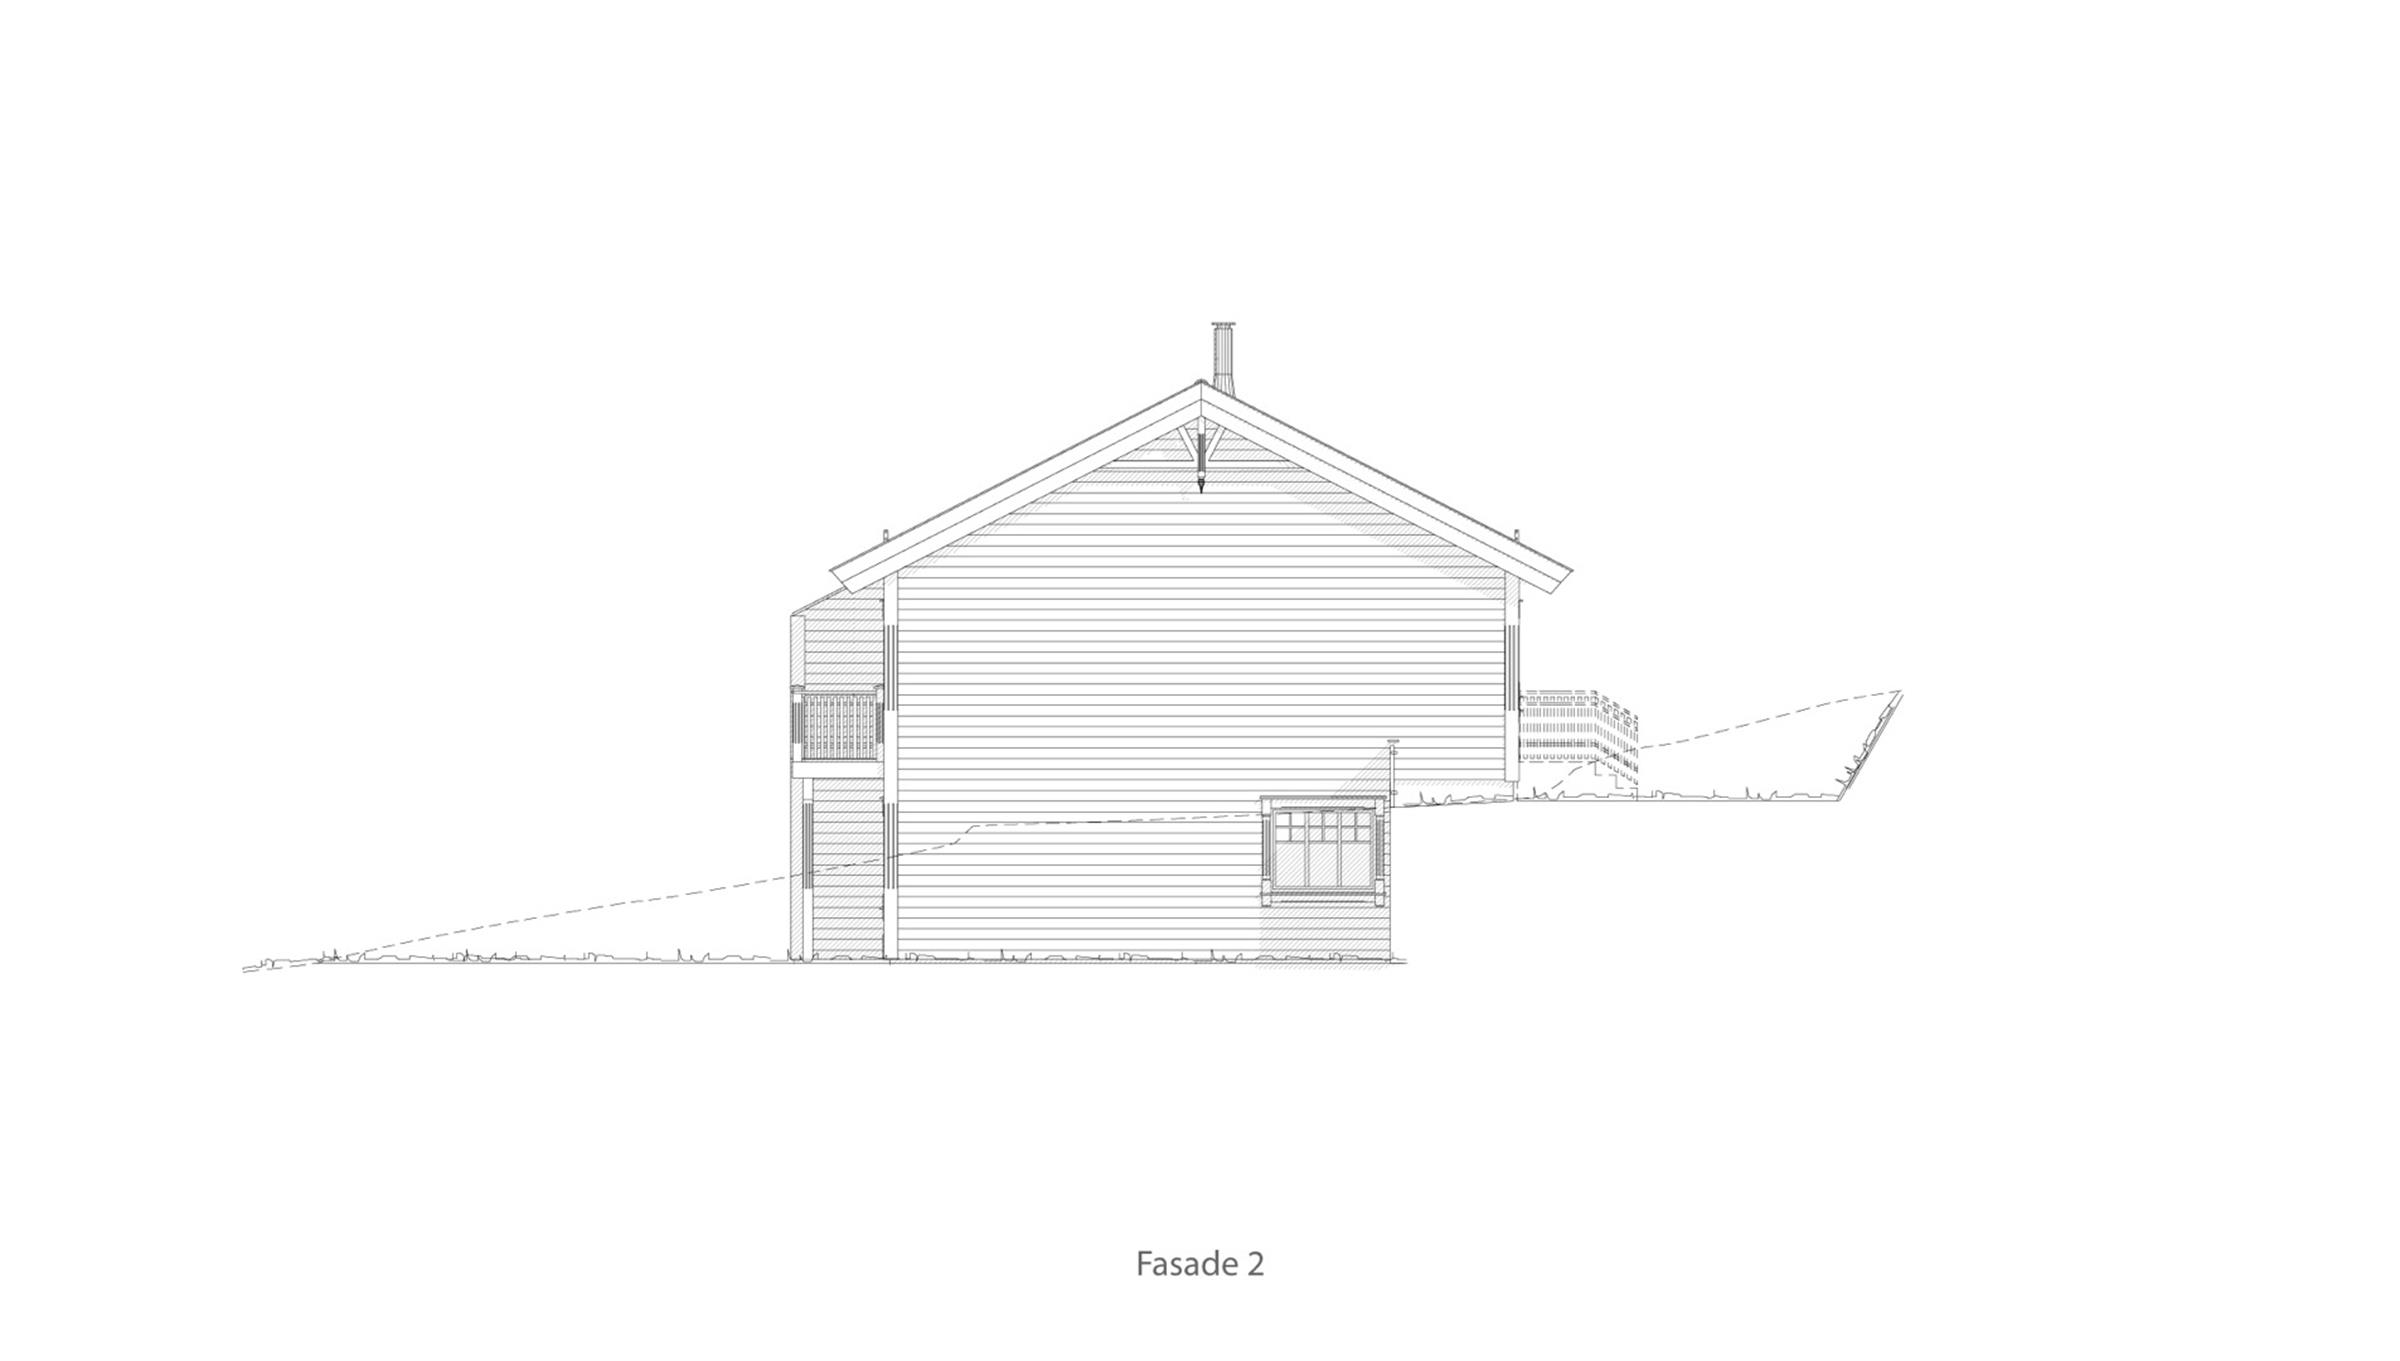 Alta fasade 2